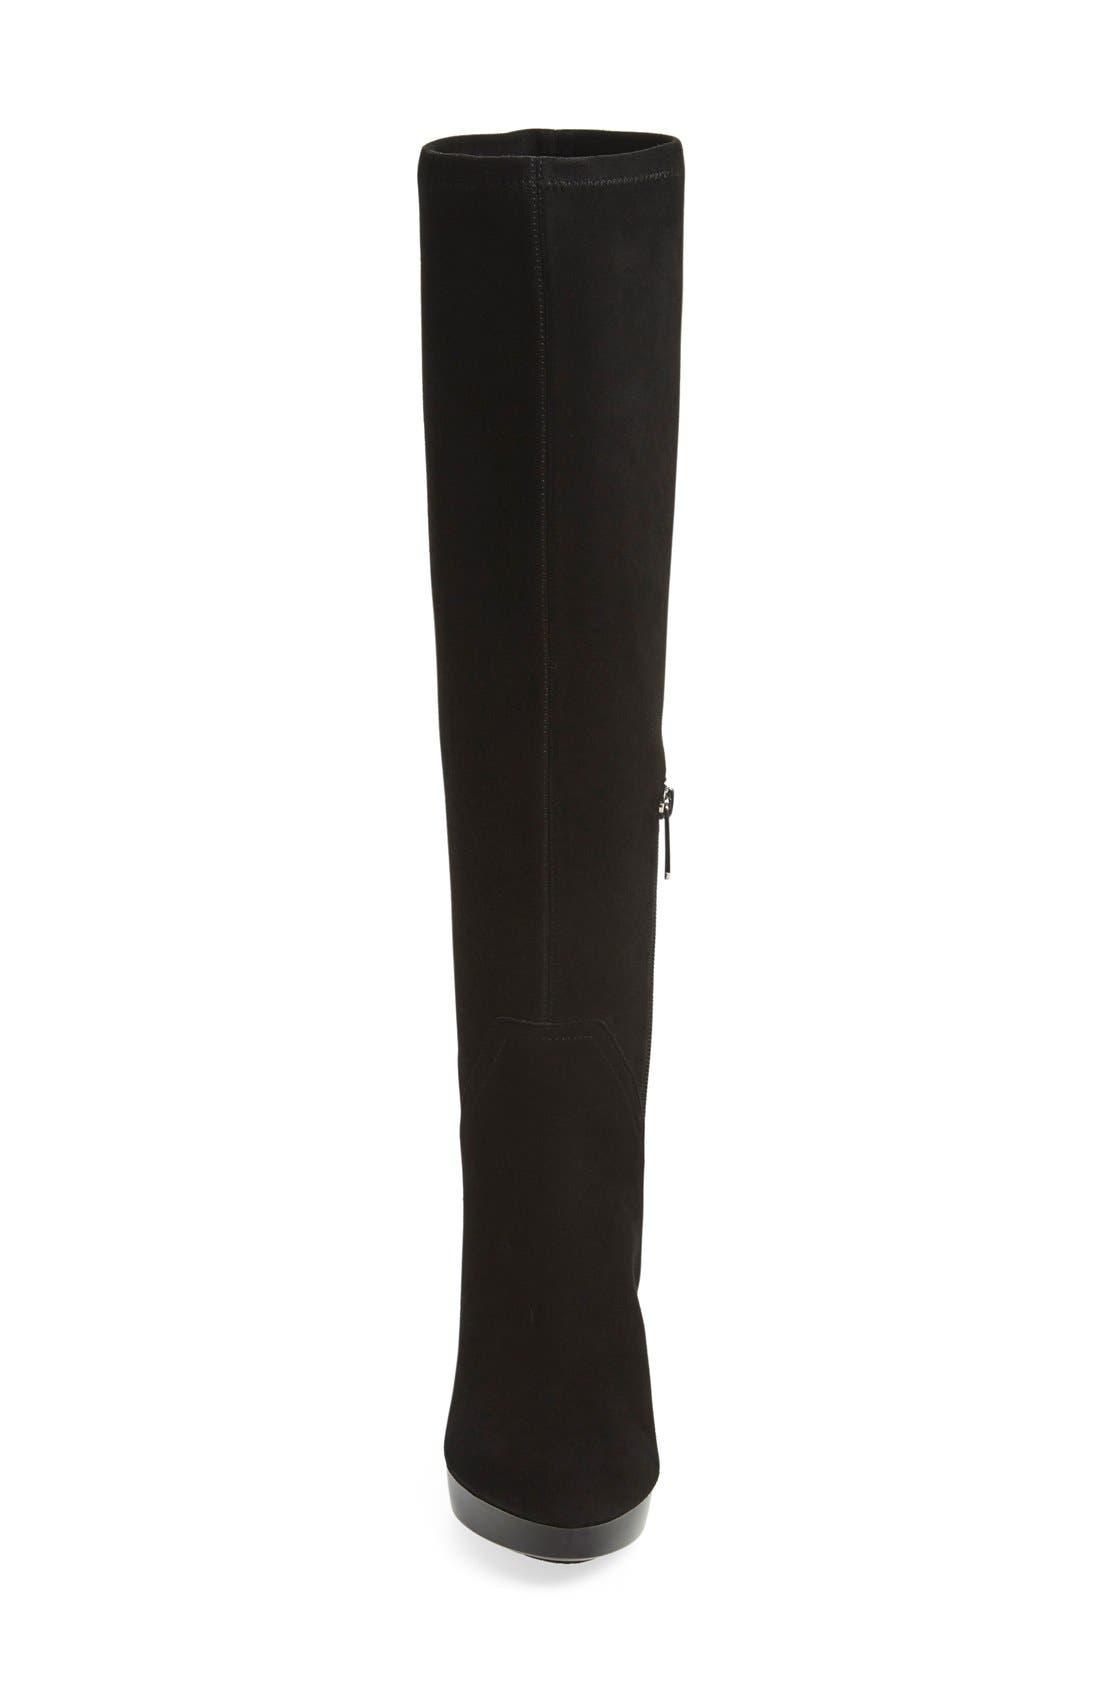 Alternate Image 3  - Donald J Pliner 'Echoe' Stretch Suede Tall Boot (Women)